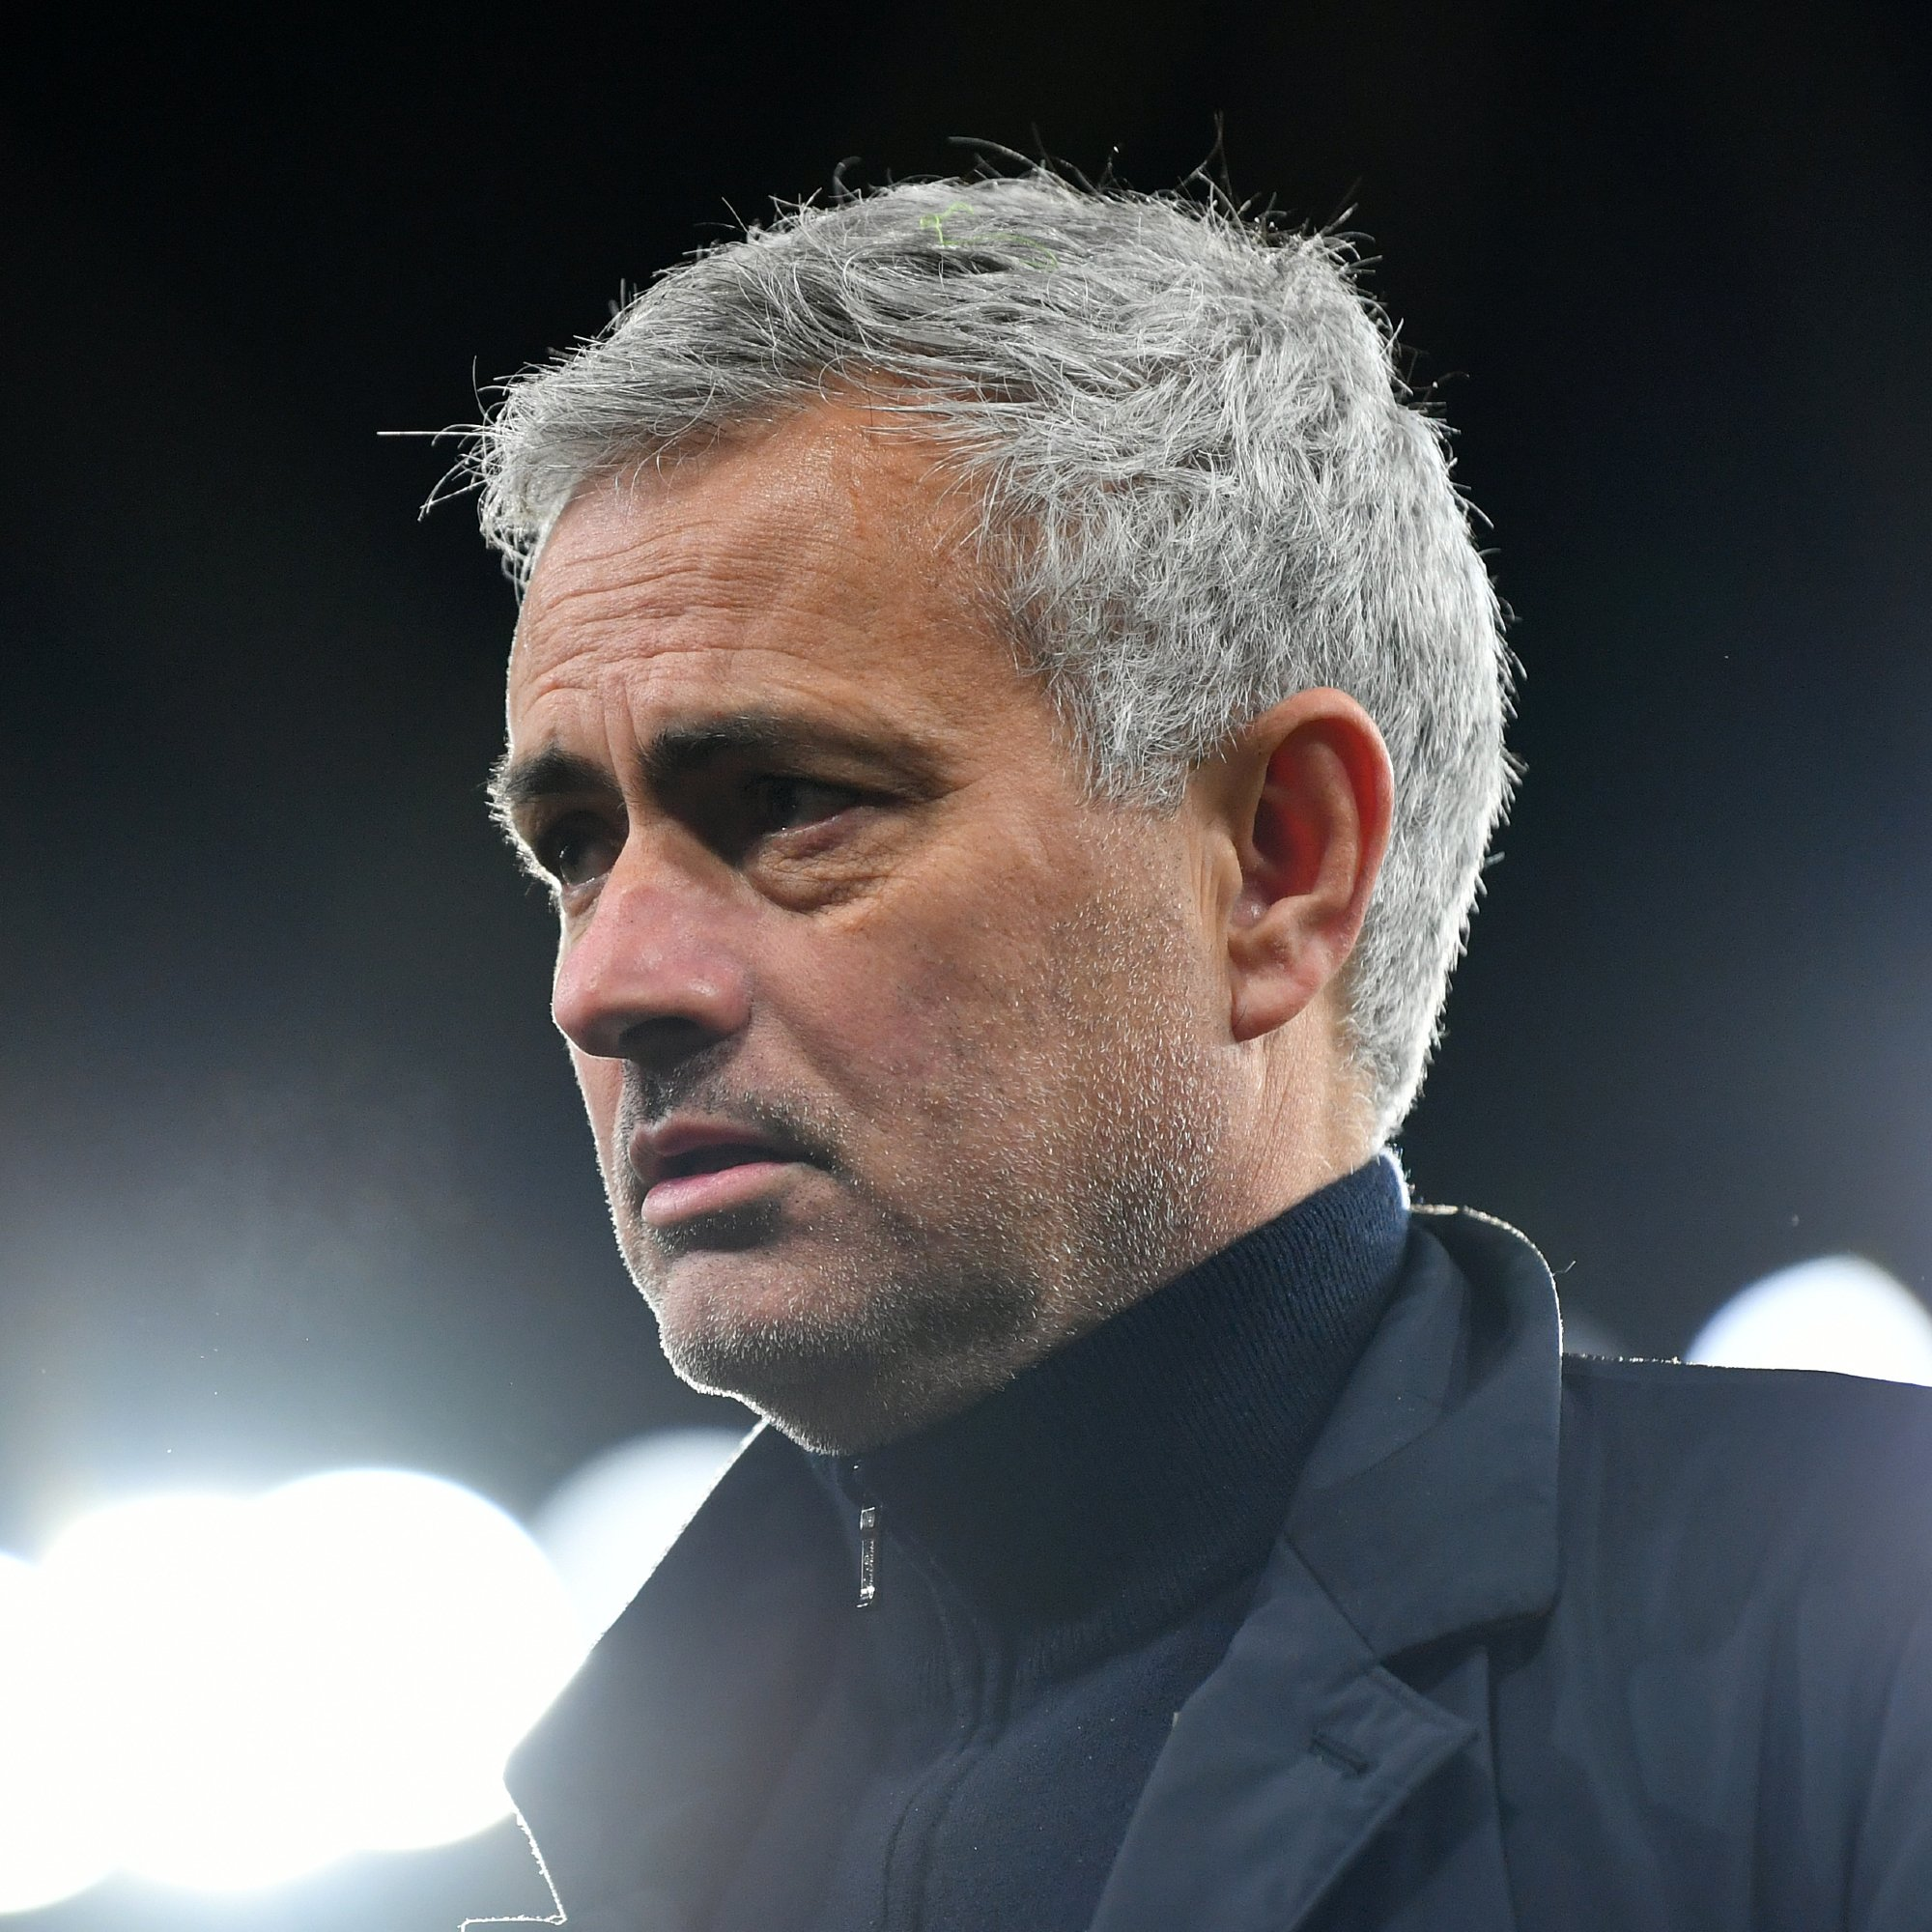 Breaking : Jose Mourinho sacked